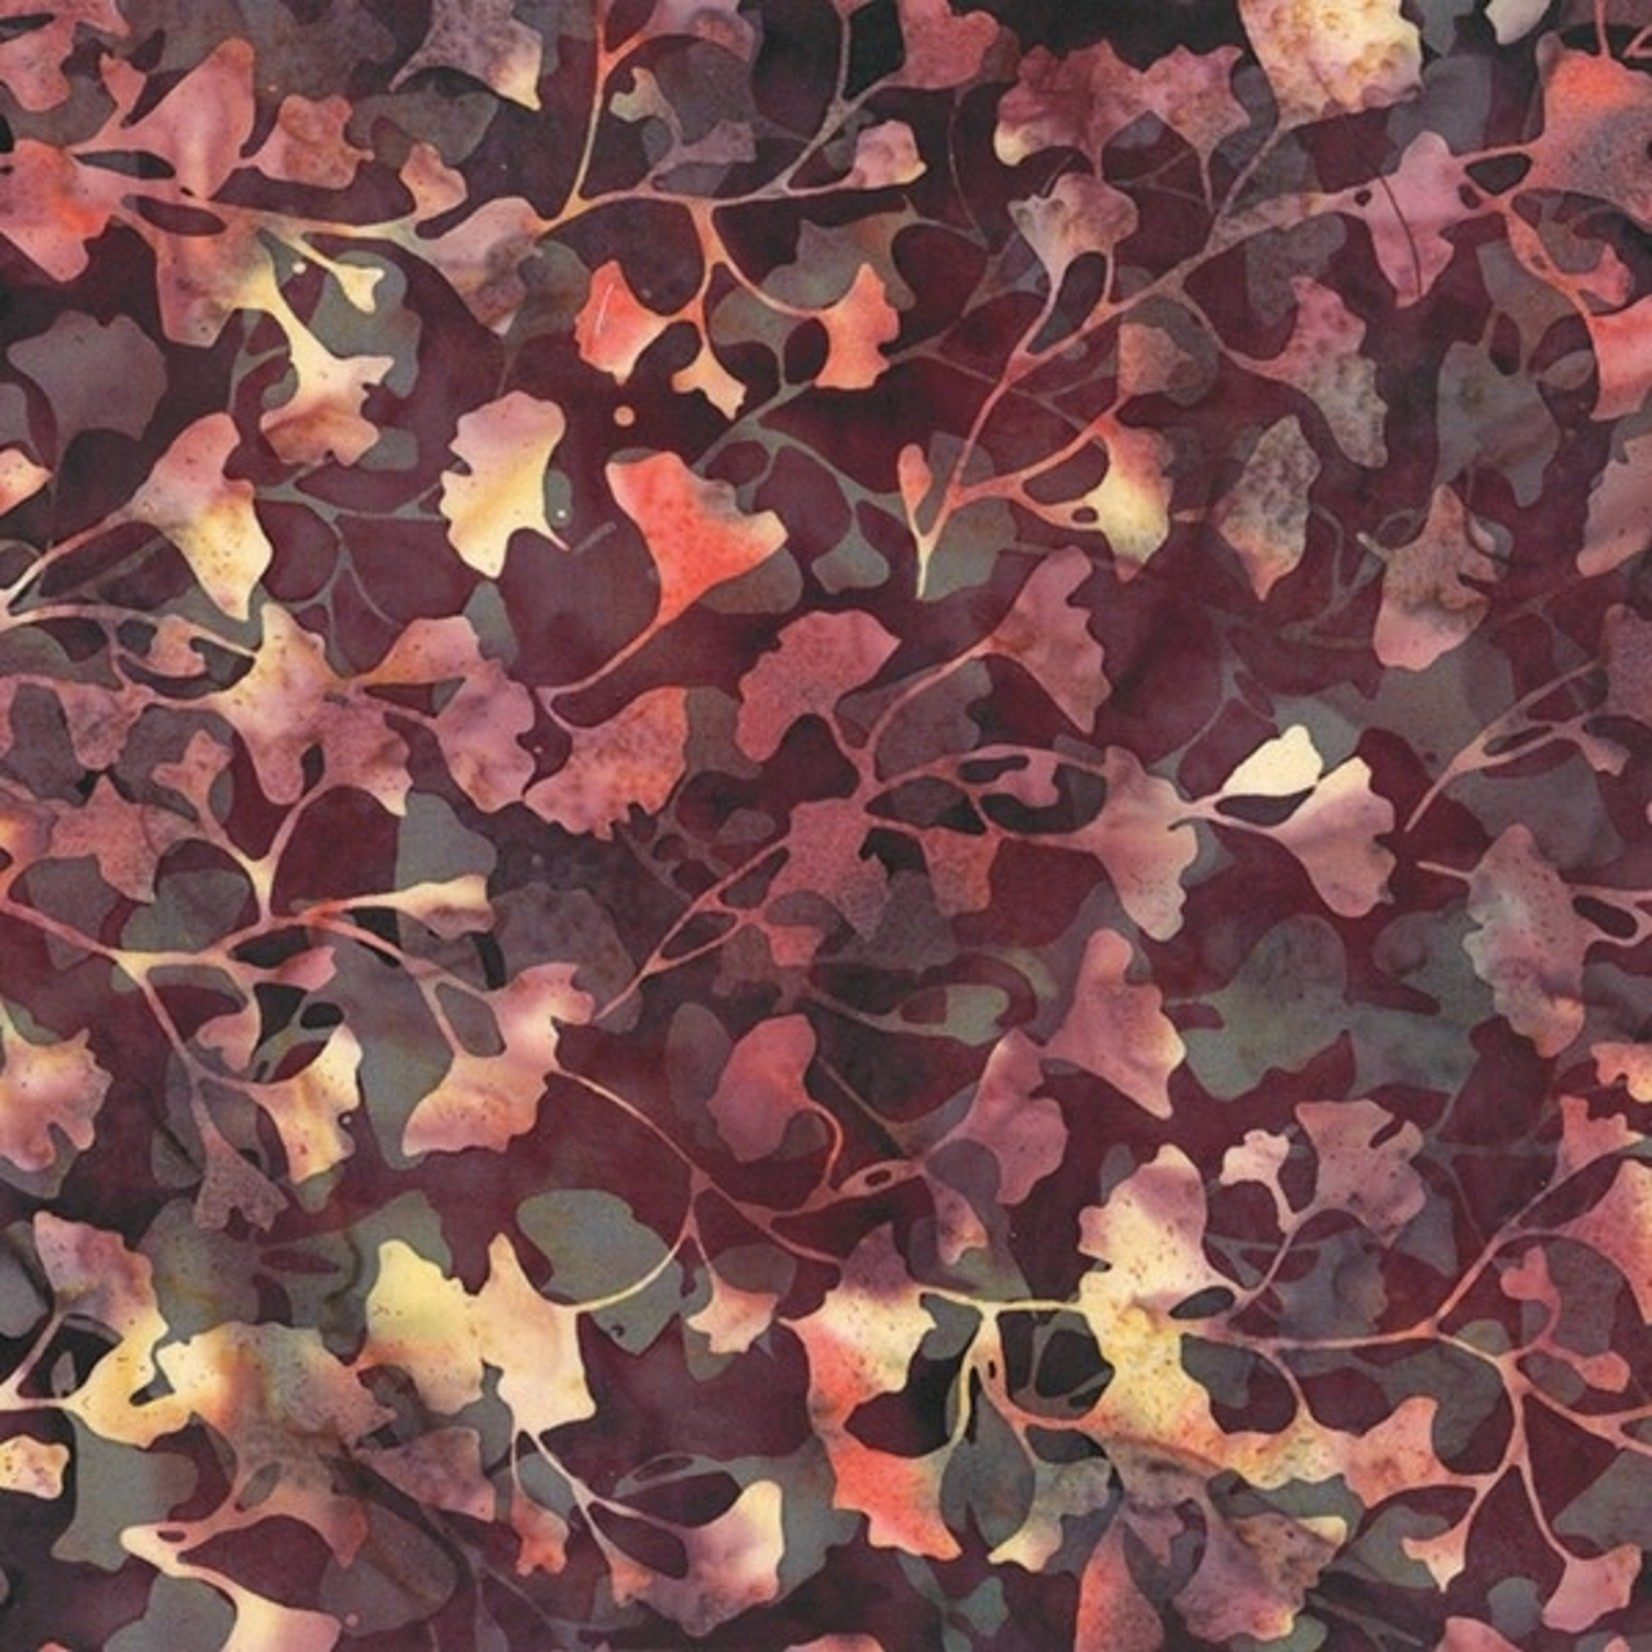 Hoffman Bali Batiks, Leaves, Nightshade 2376-533 $0.20 per cm or $20/m